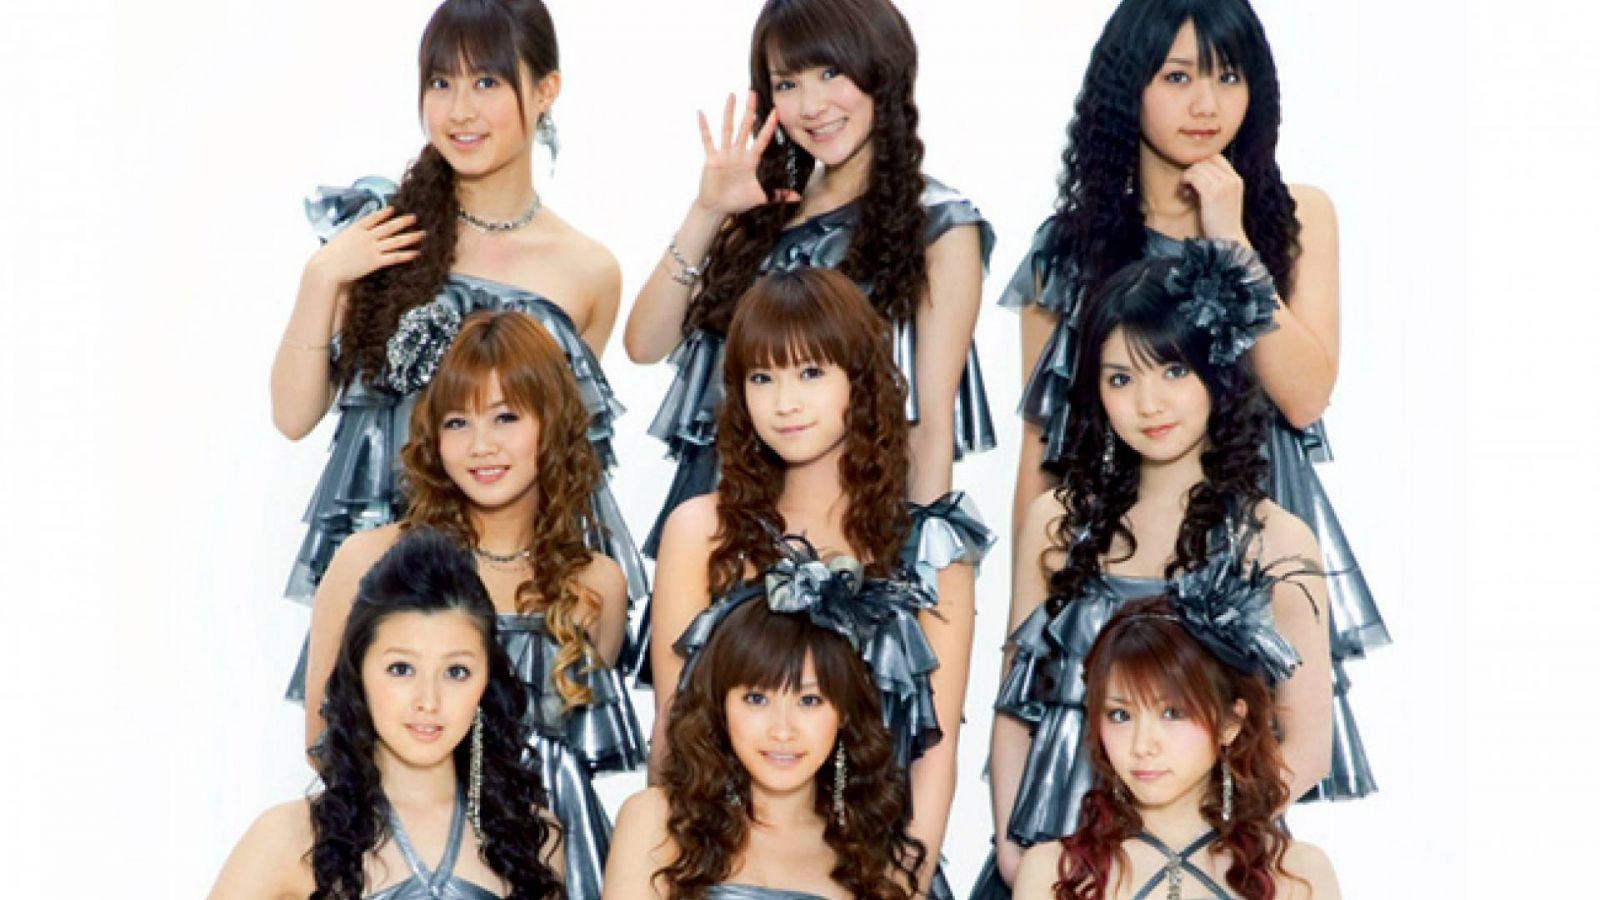 Novo DVD ao vivo do Morning Musume. © JapanFiles.com / Up Front Agency